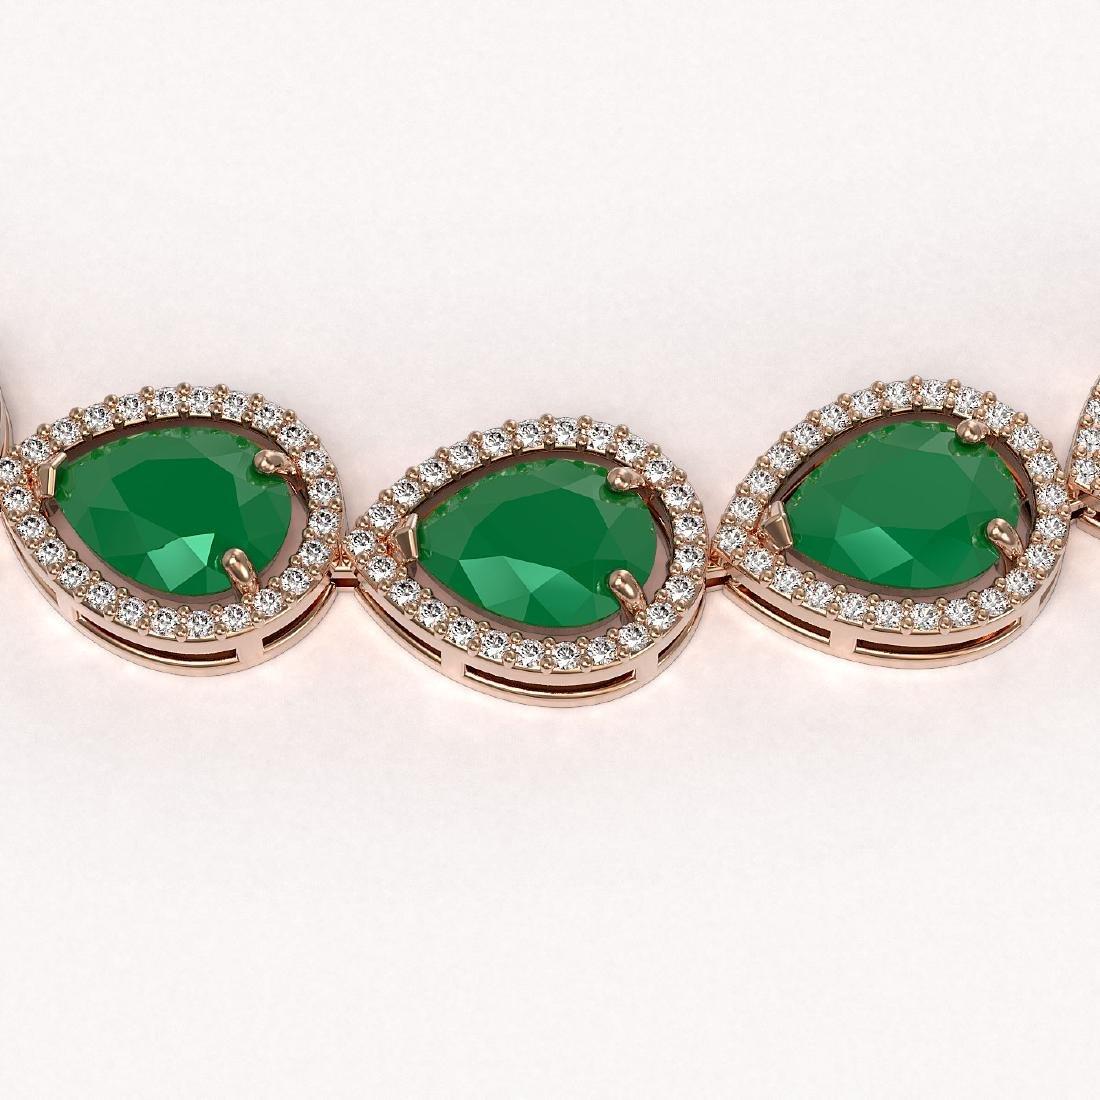 64.01 CTW Emerald & Diamond Halo Necklace 10K Rose Gold - 3